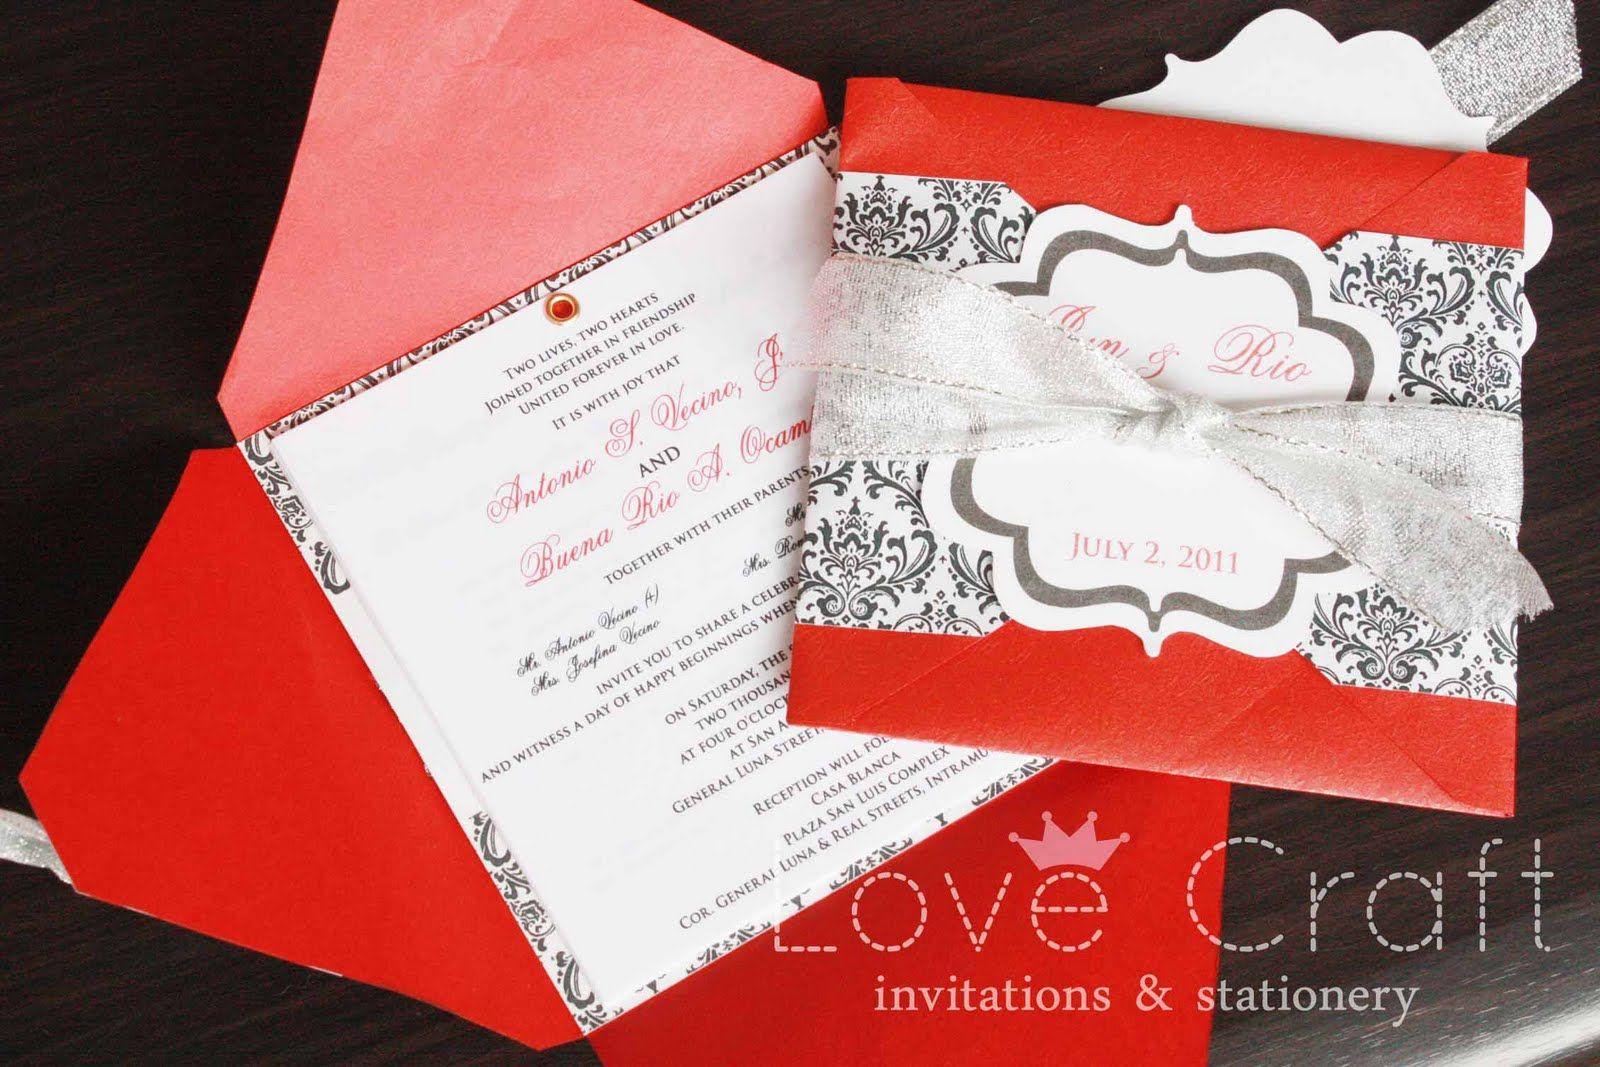 Petal Fold Invitation | Weddings | Pinterest | Weddings and Wedding